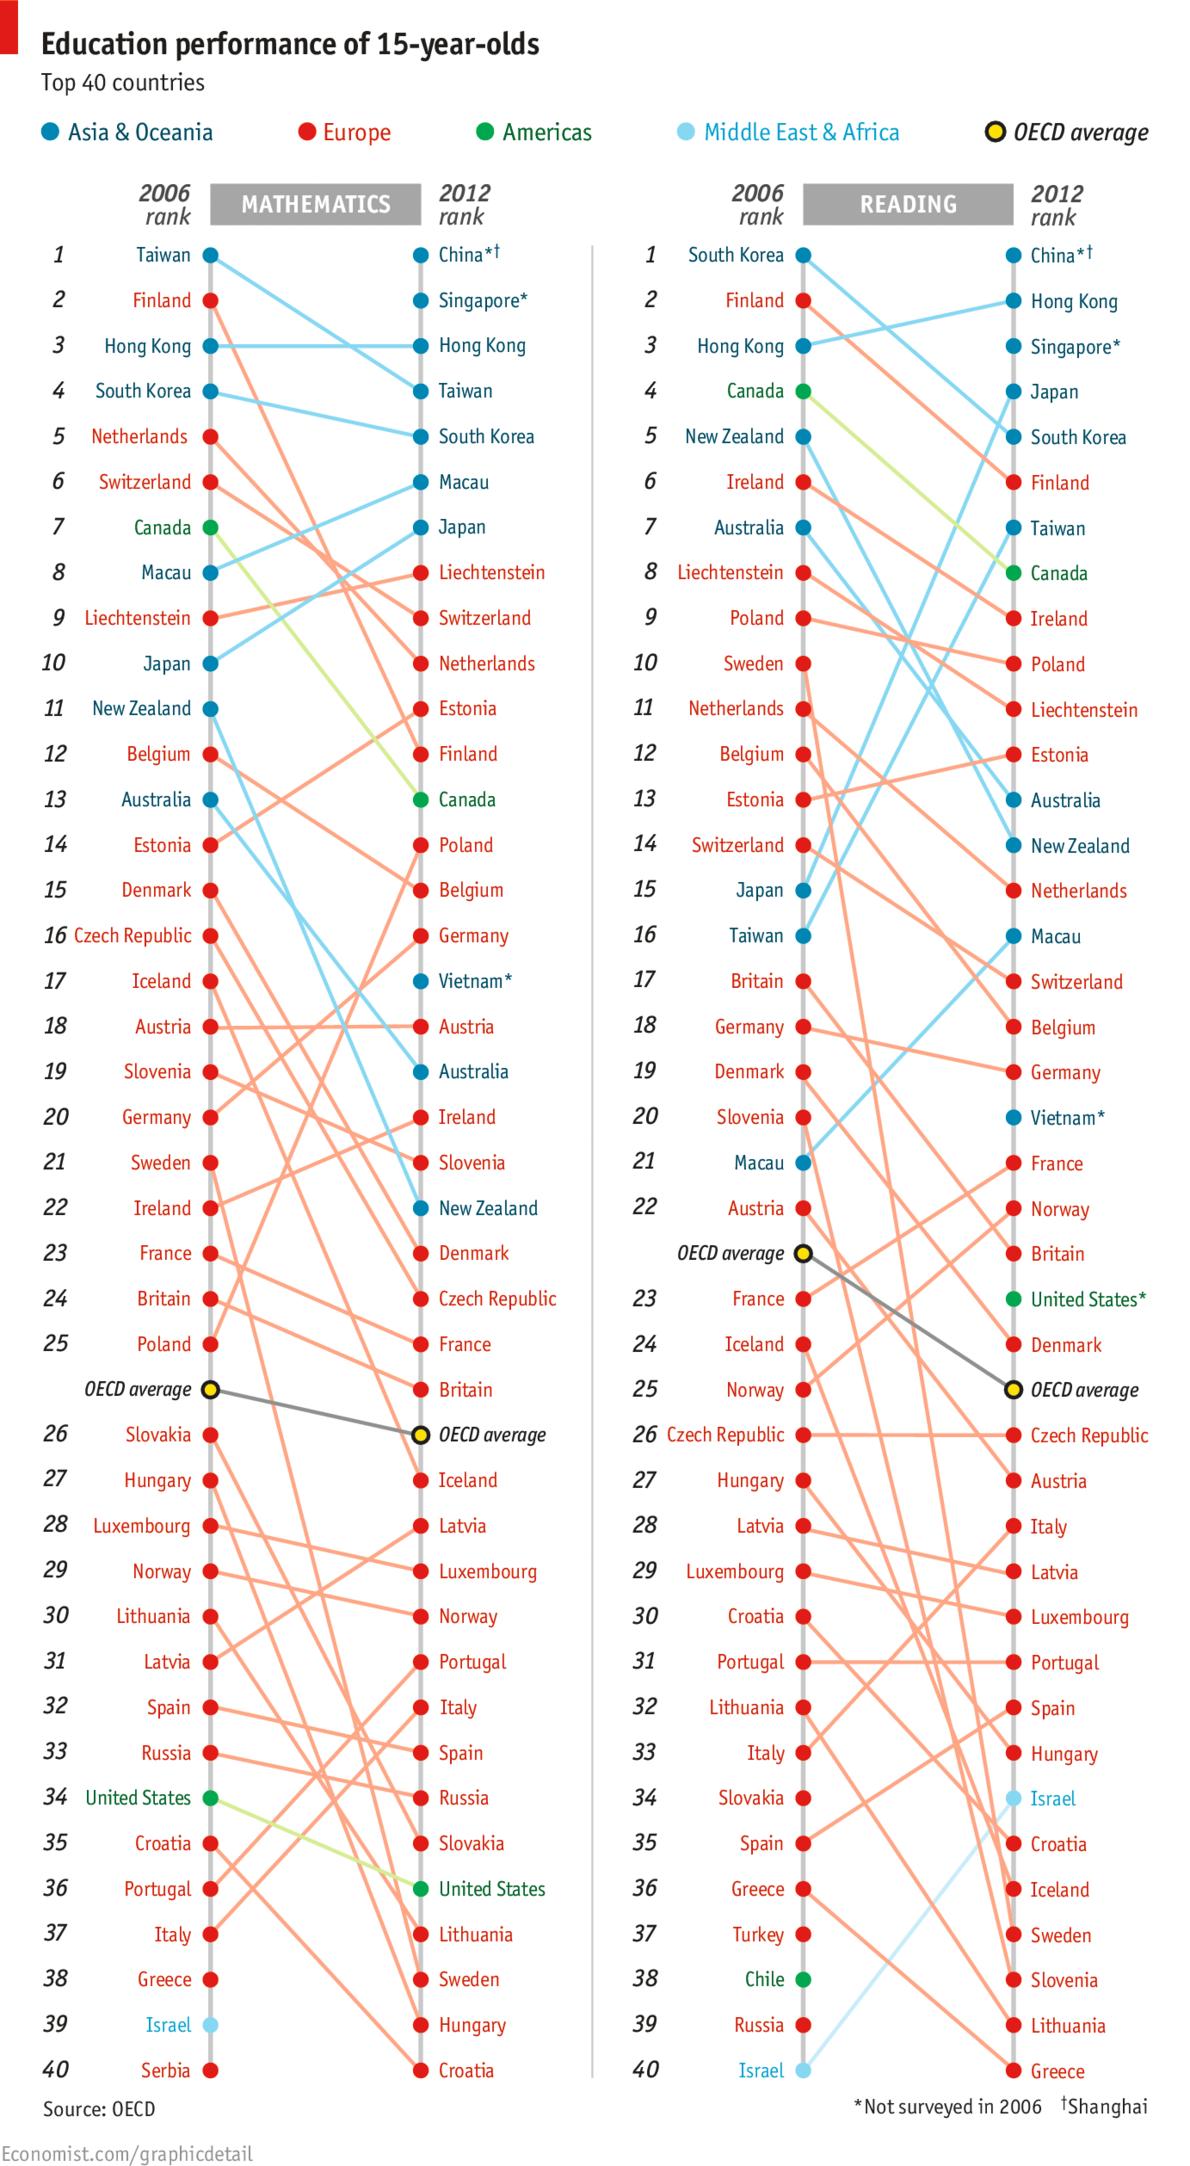 PISA results 2012 image